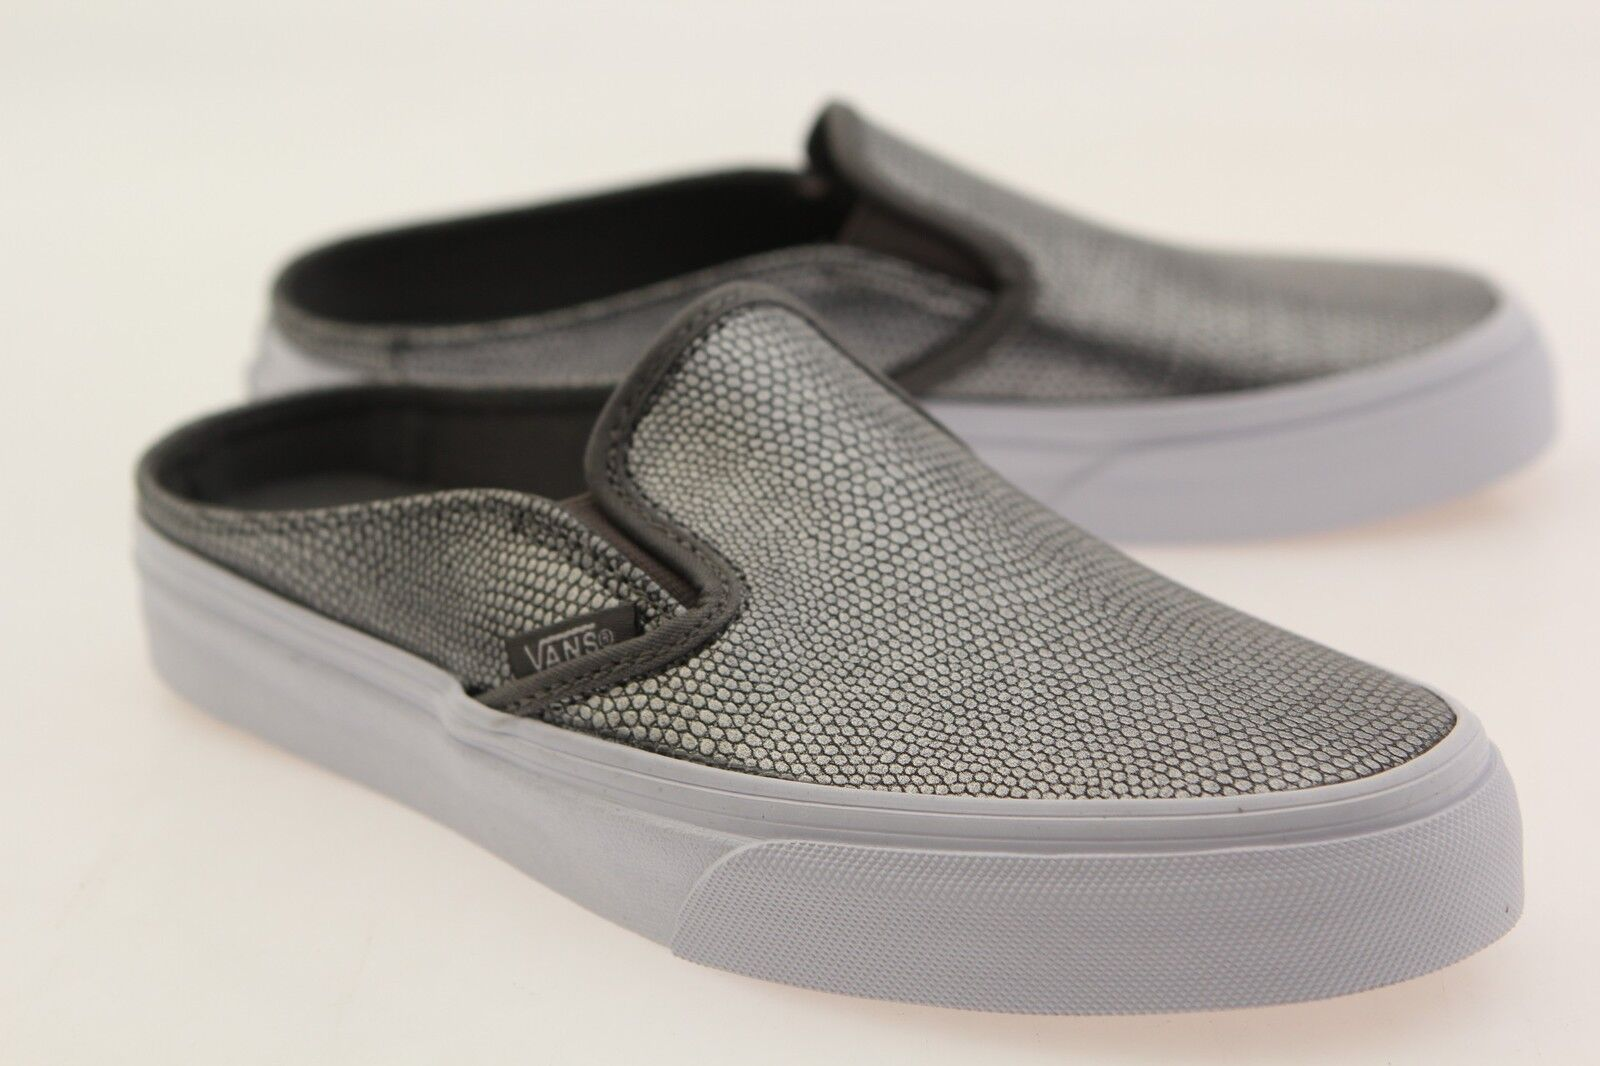 Vans Damens Classic Slip-On Mule - Embossed Leder gray true WEISS VN04KTIDQ